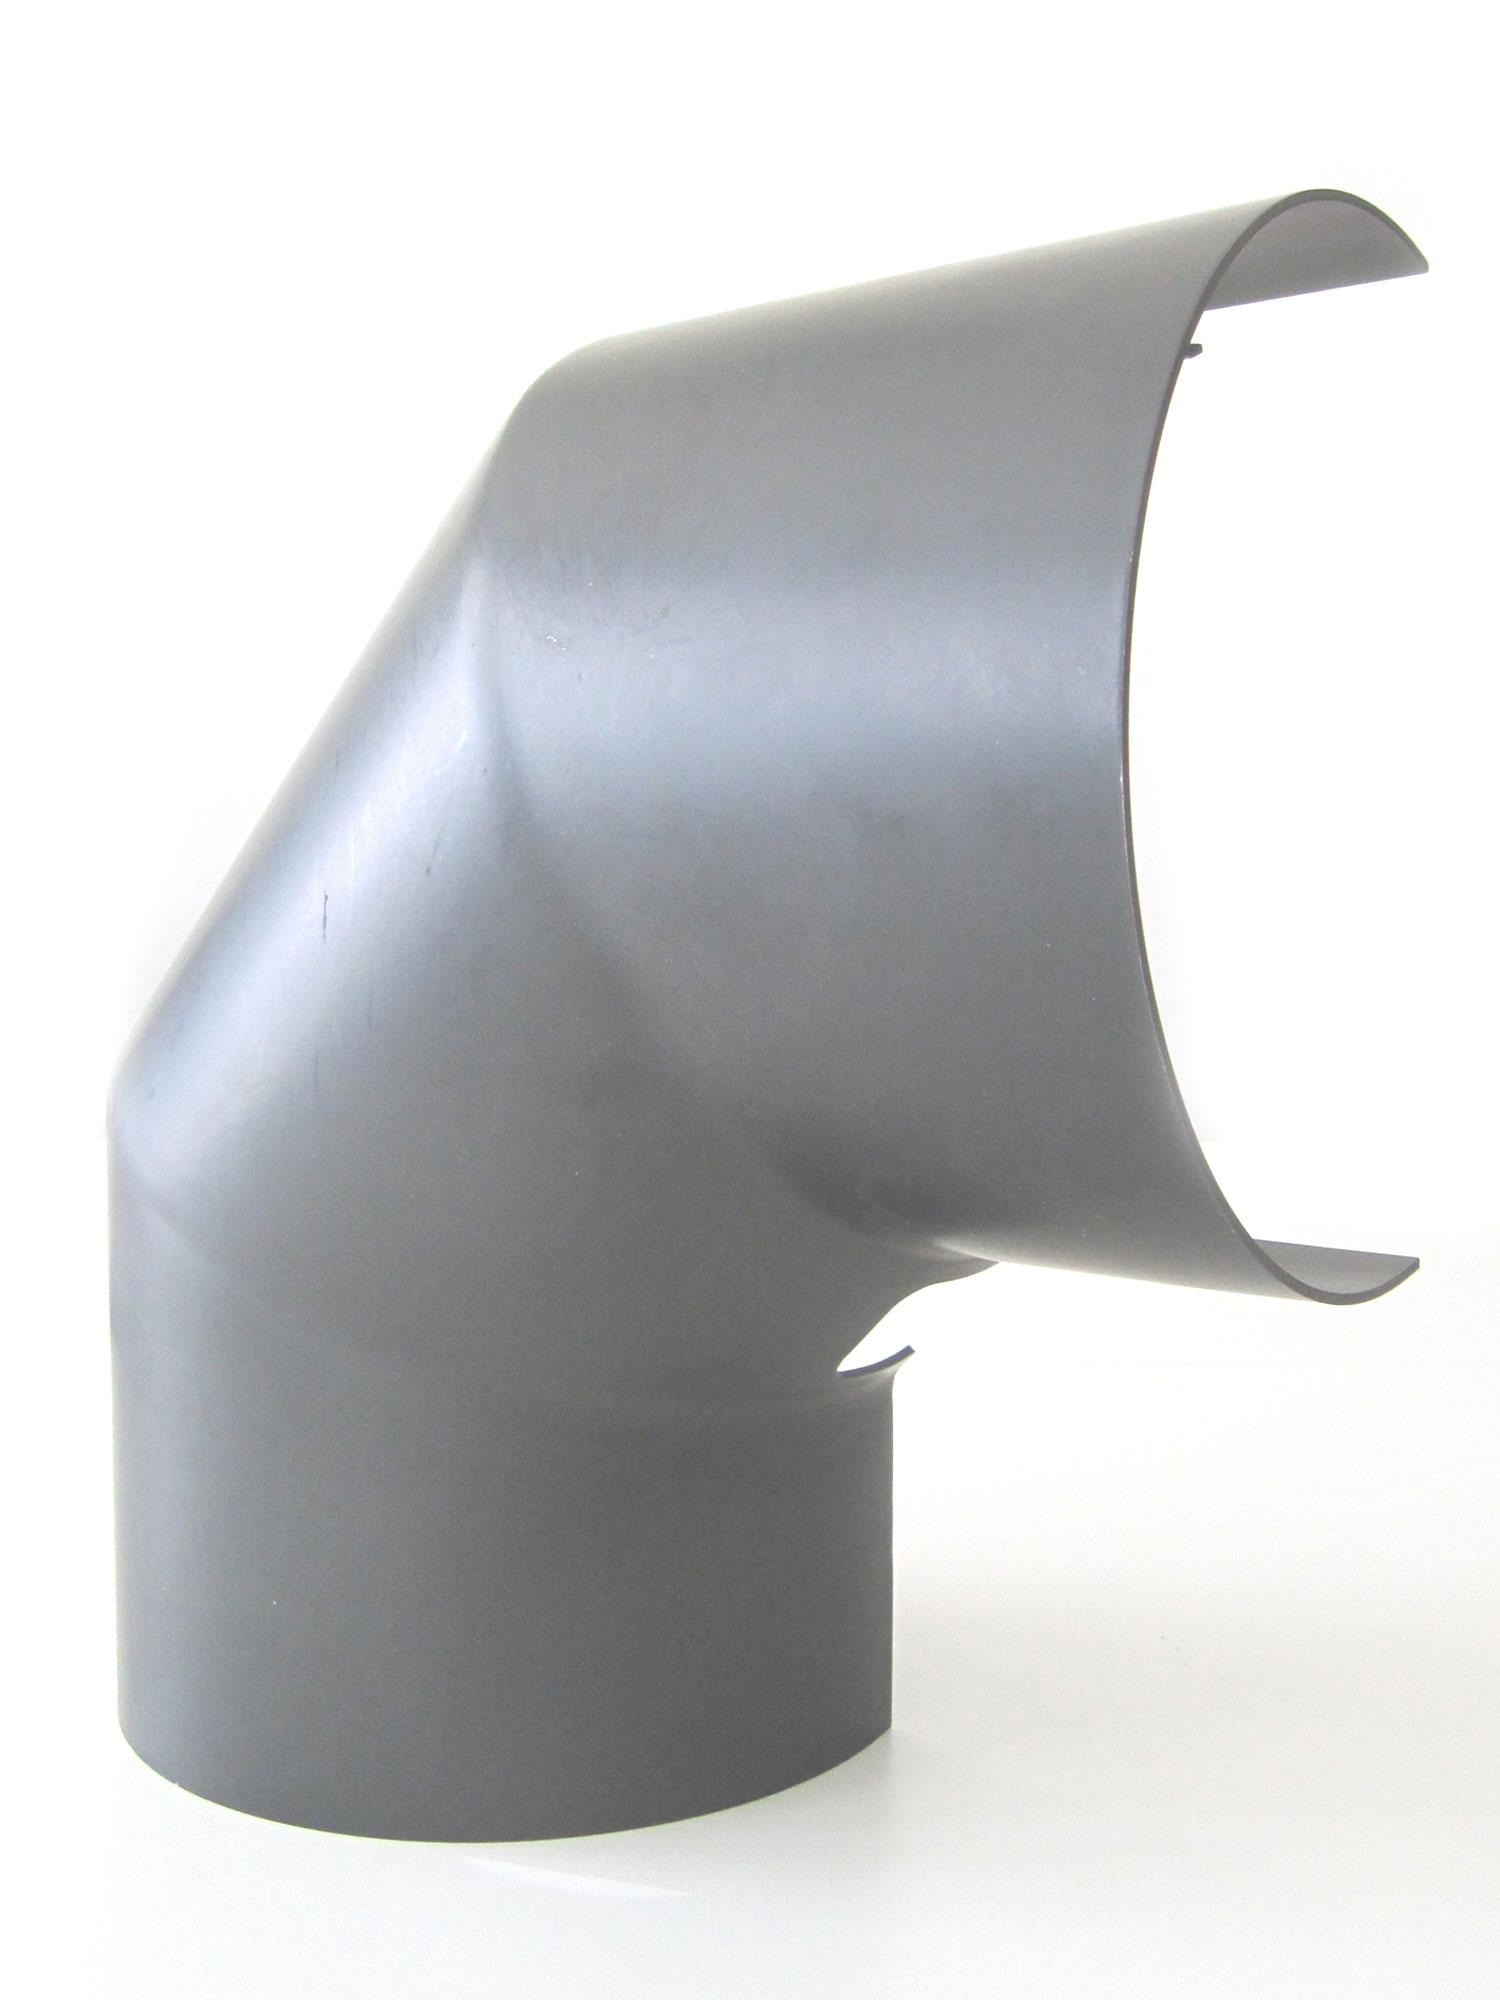 Hitzeschutz Rohrblende Winkel 90° Stahlblech grau Ø120mm seitlich Bild 3